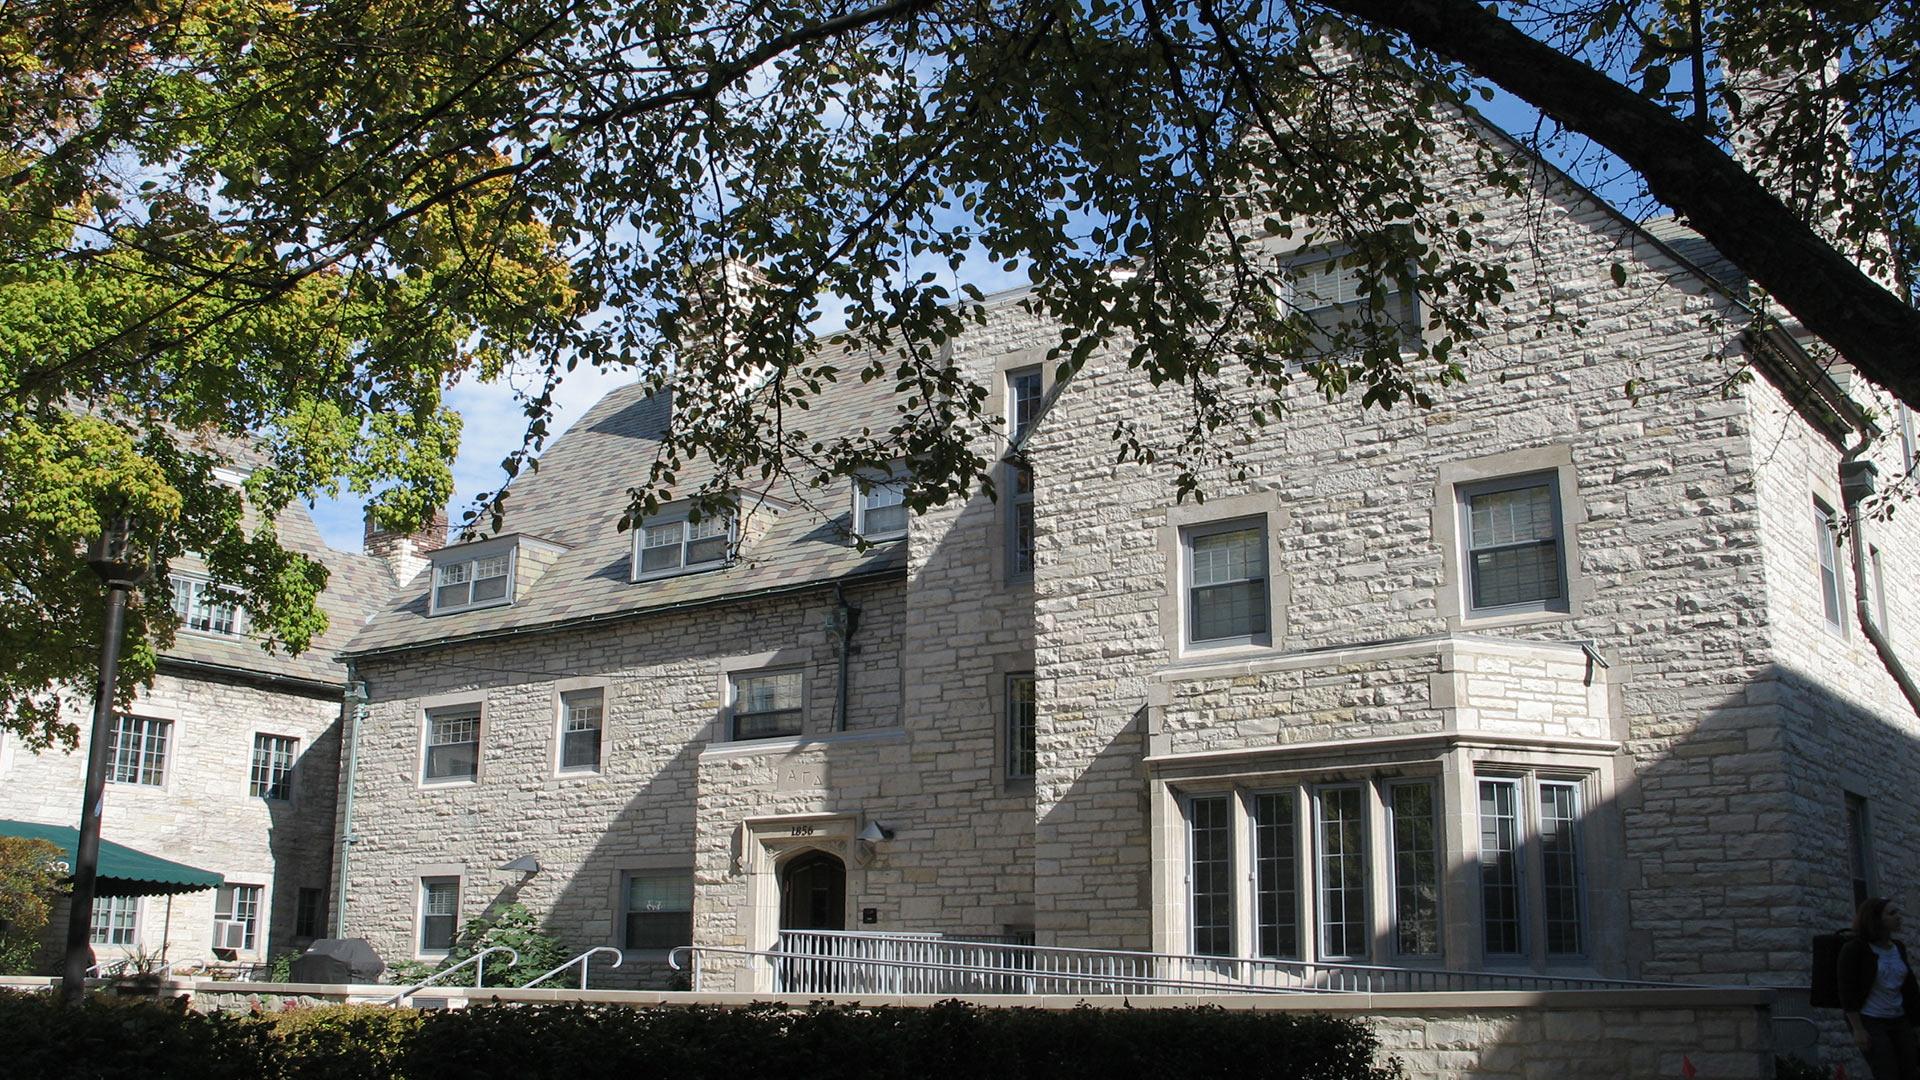 Northwestern University 1856 Orrington Residence Hall